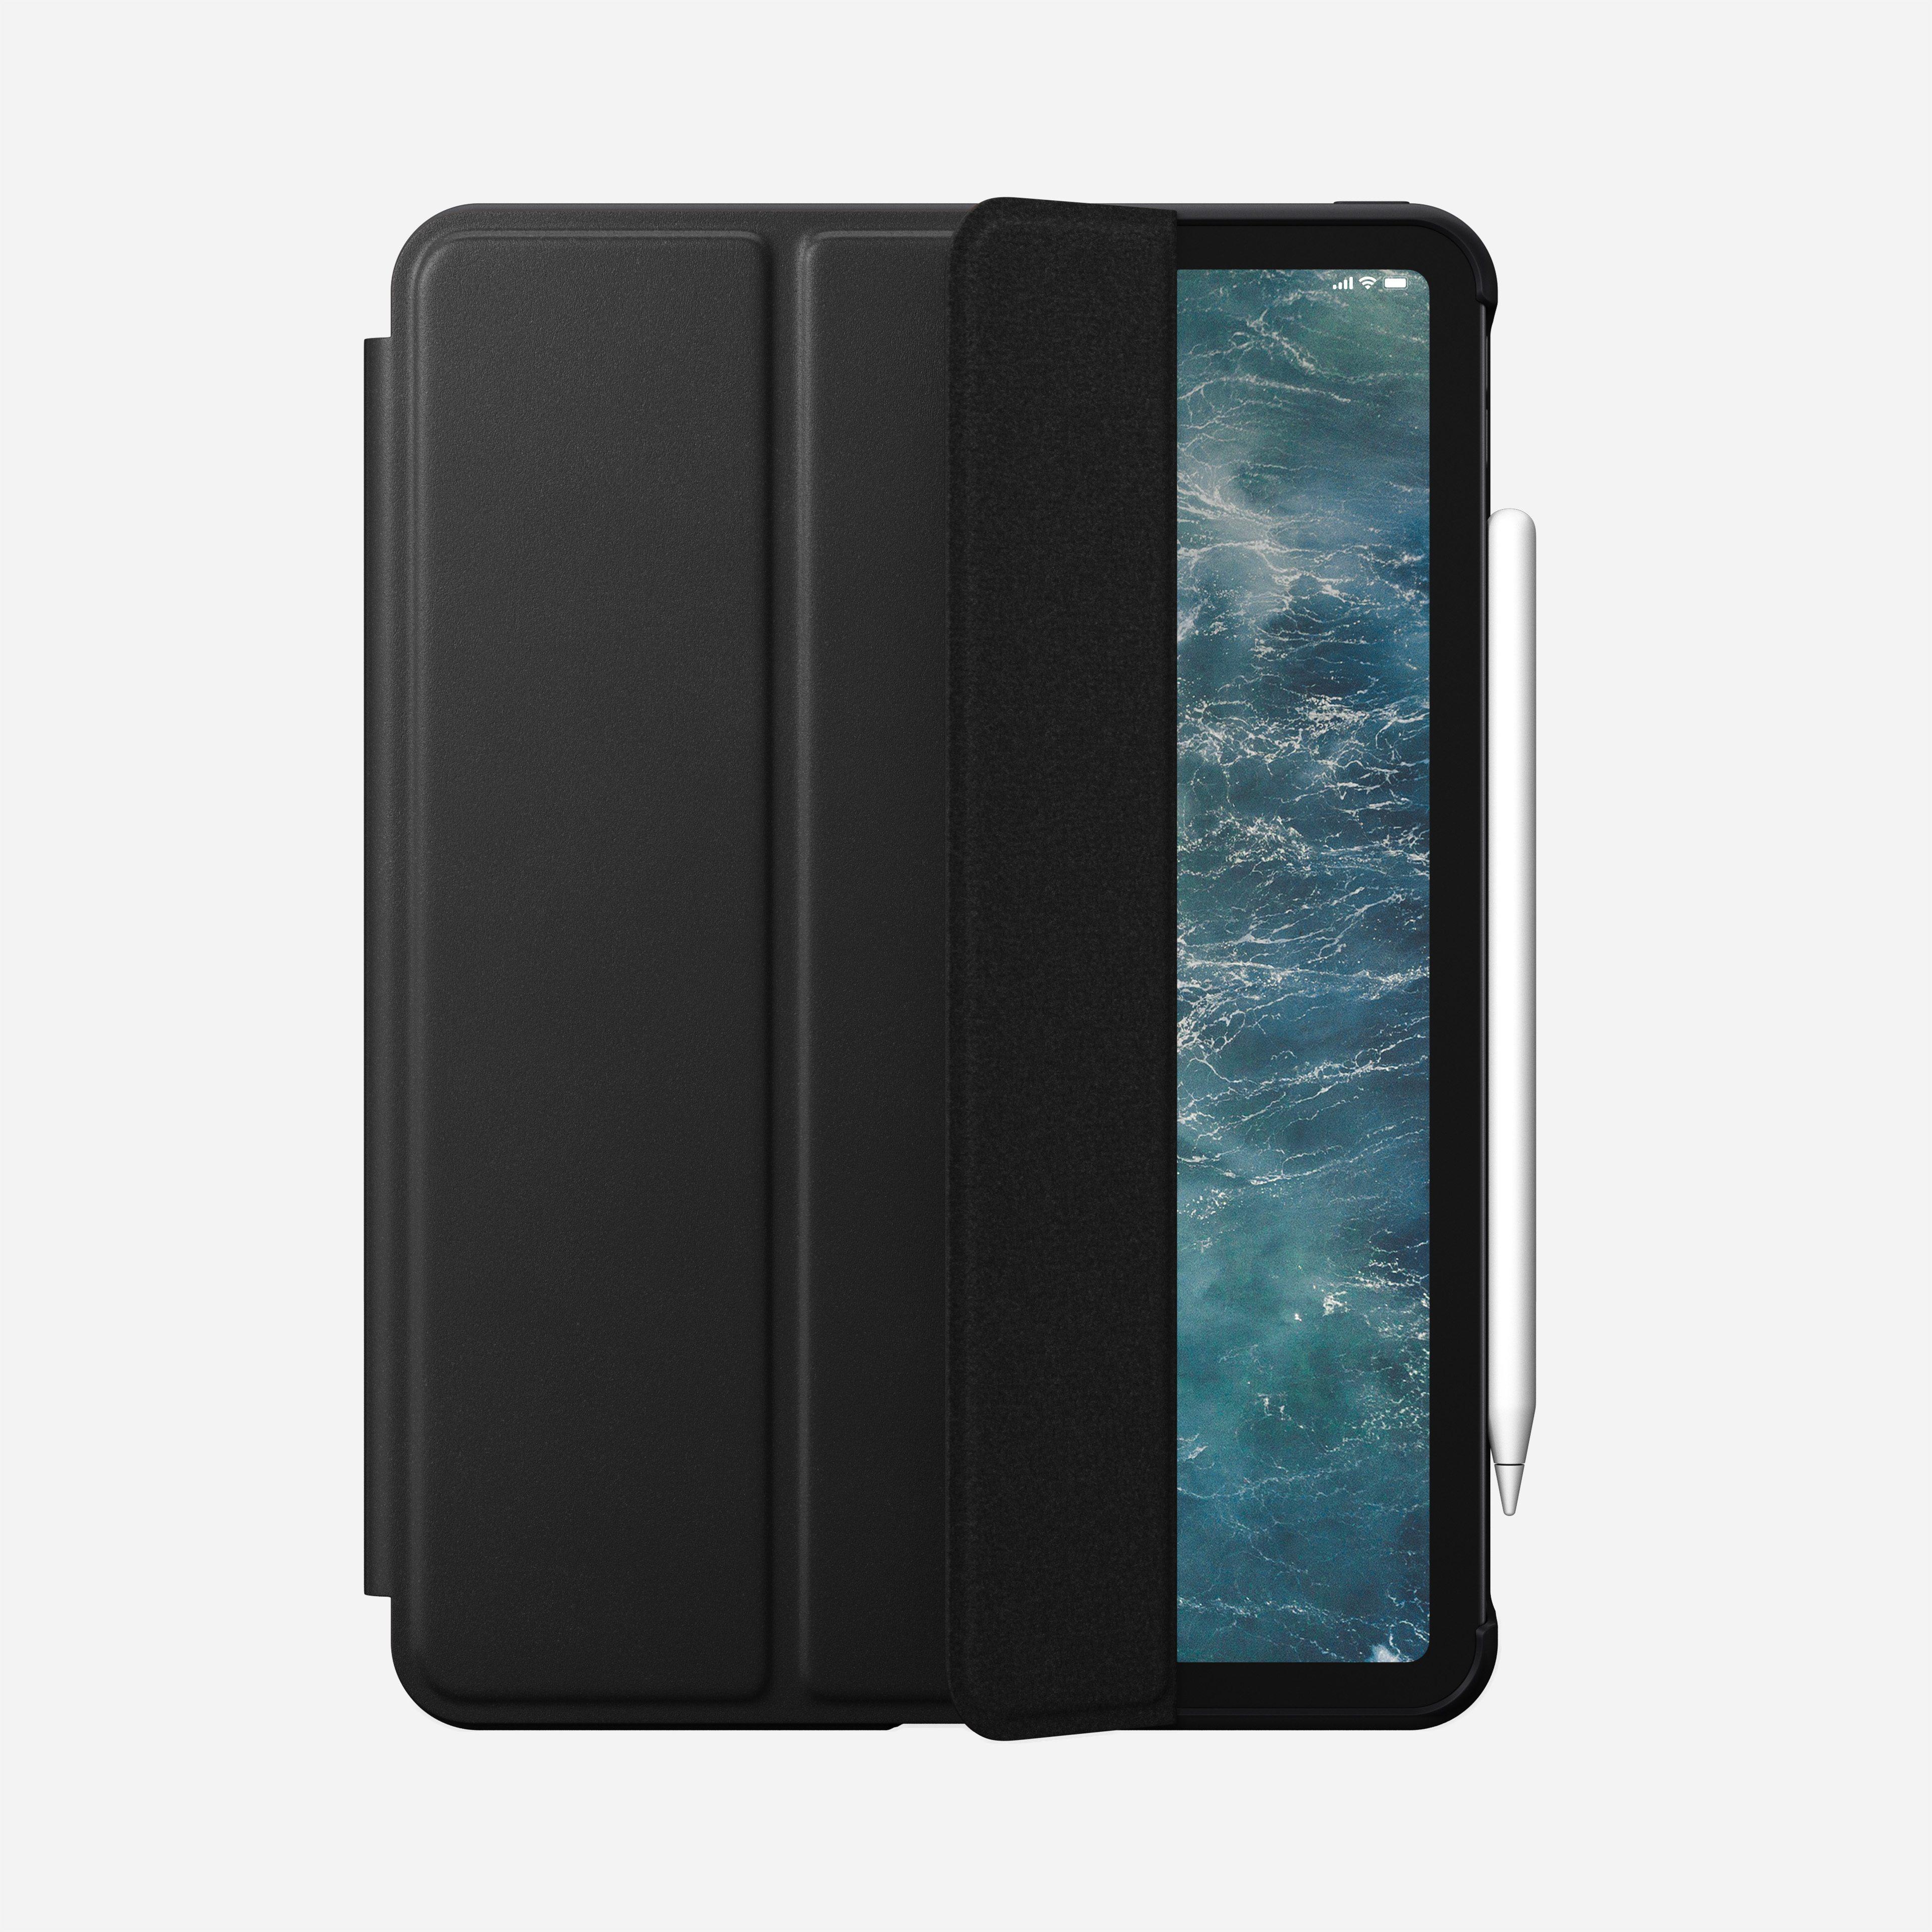 Rugged folio horween leather black ipad pro 11 inch 2nd generation